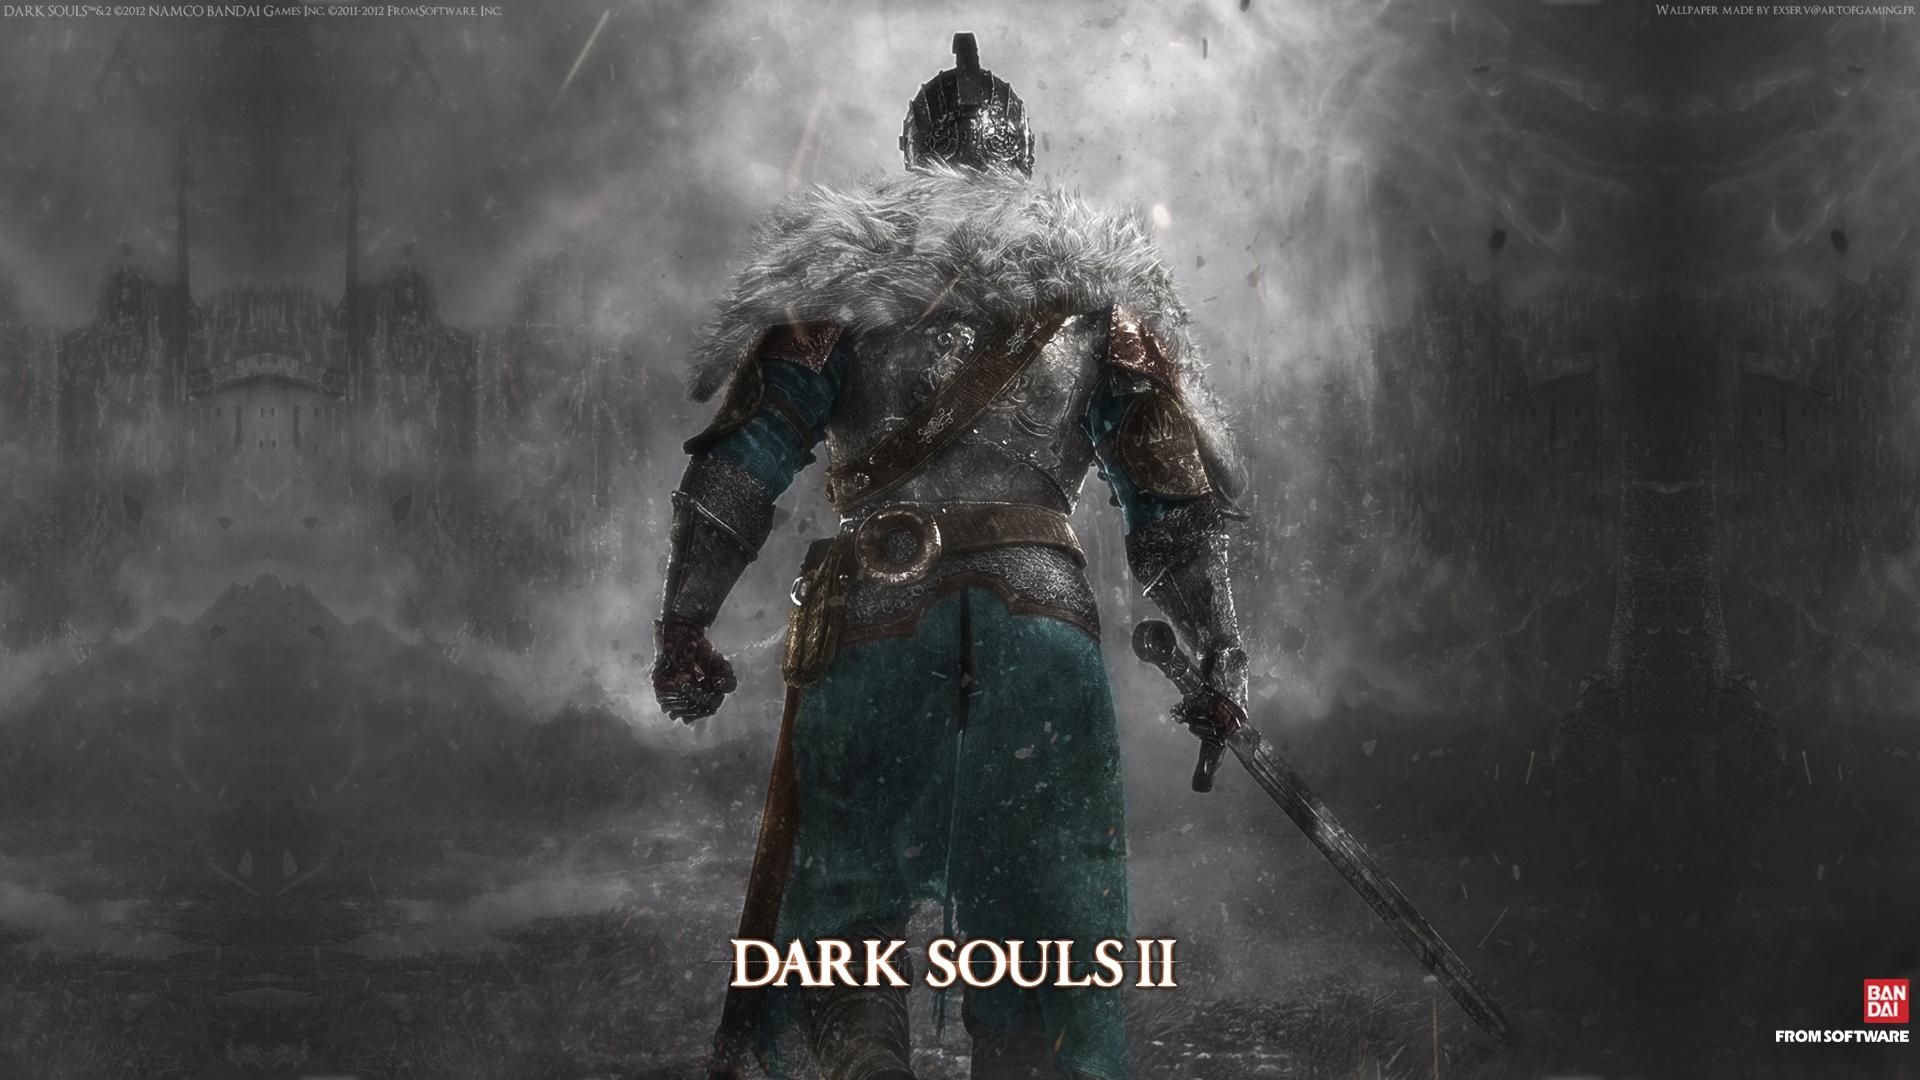 ... http://hdw.datawallpaper.com/videogames/dark-souls-2-327867.jpg